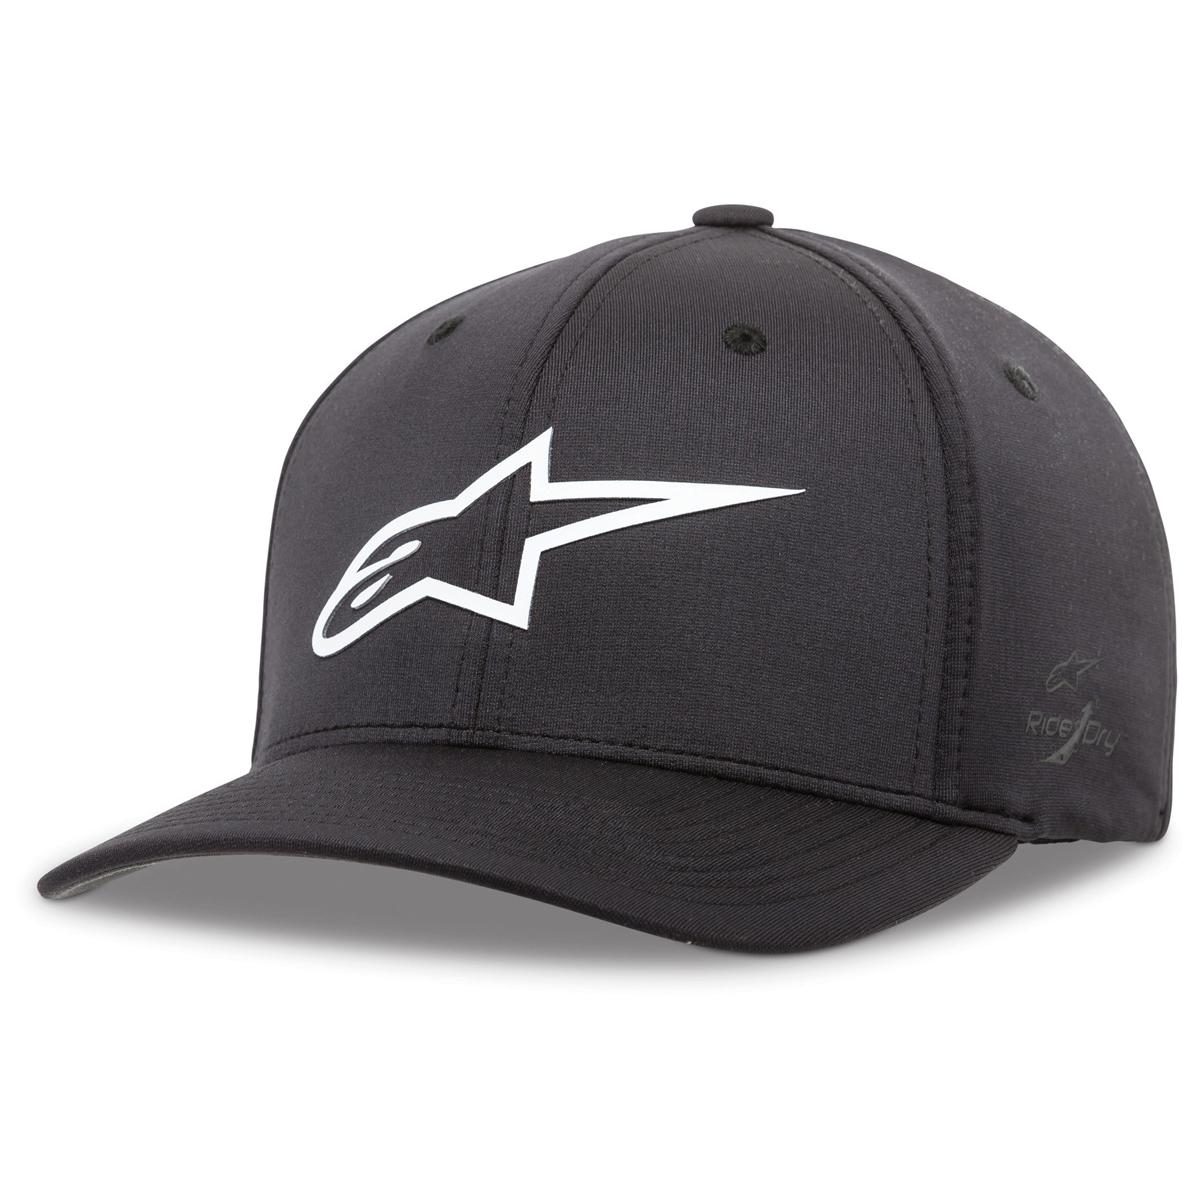 Alpinestars Ageless Sonic Tech Black/White Flexfit Hat